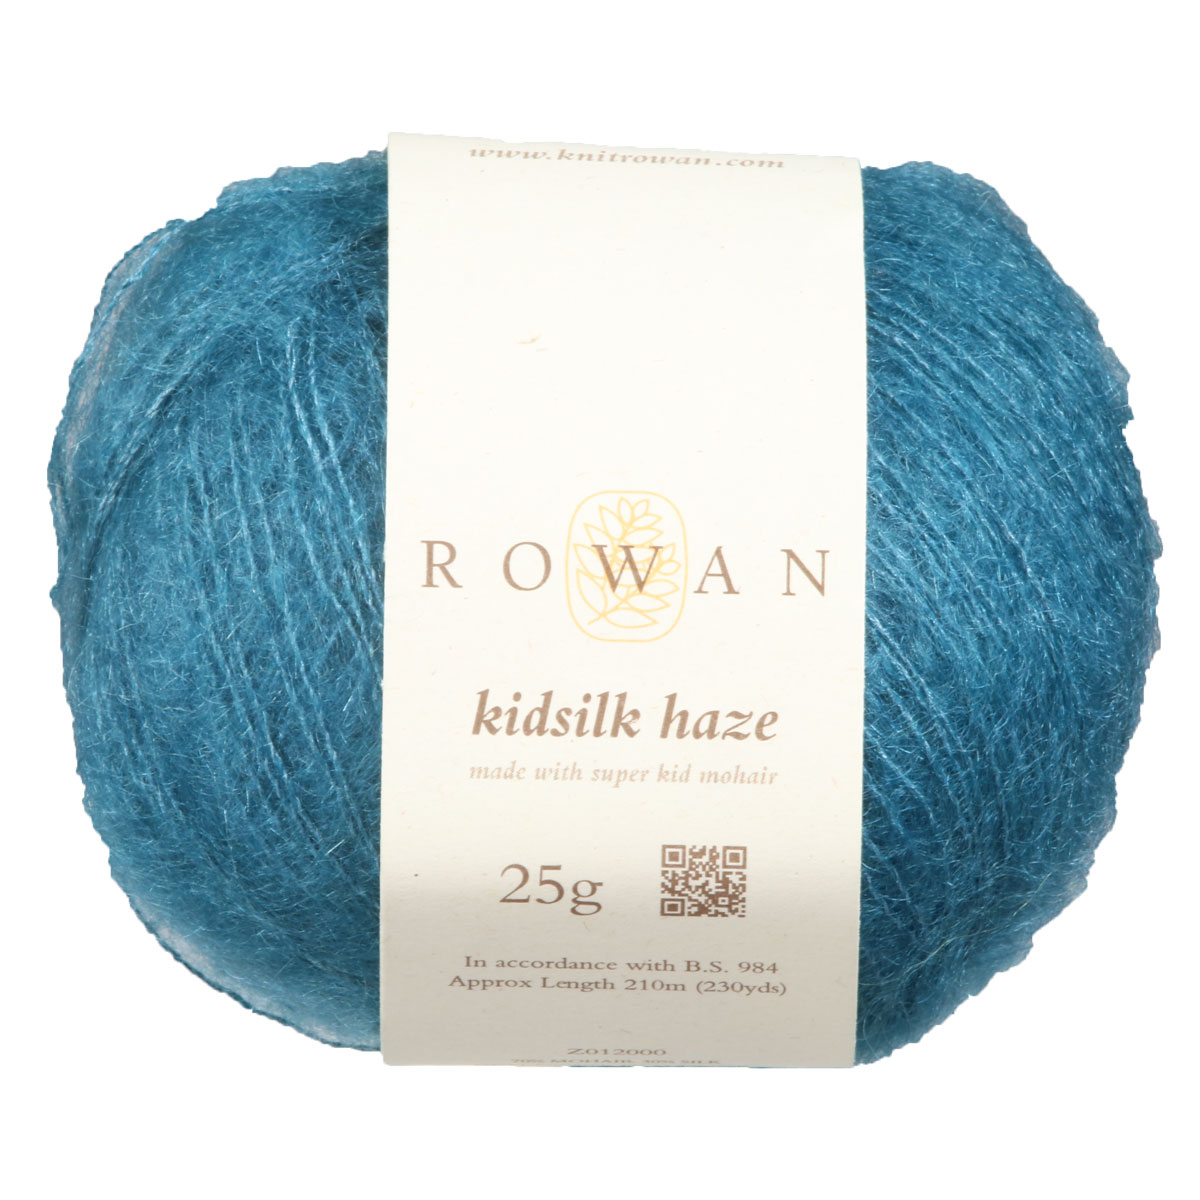 Rowan Kidsilk Haze 671 Peacock